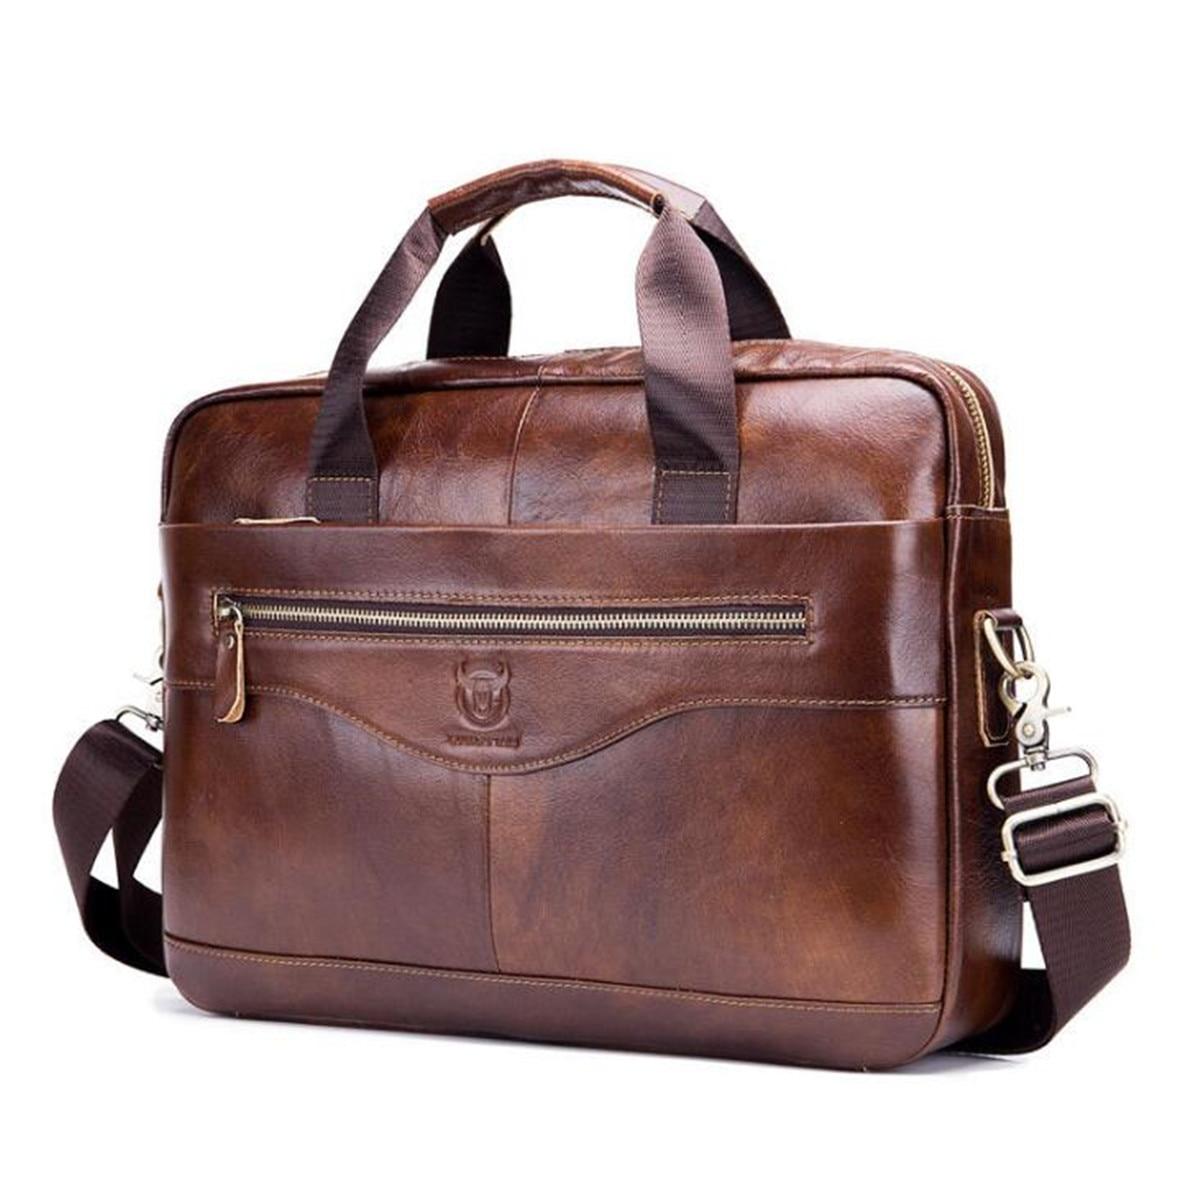 Men Briefcases Lawyer Genuine Leather Handbag Vintage Laptop Briefcase Male Computer Shoulder Bags Casual Men's Bag Documents